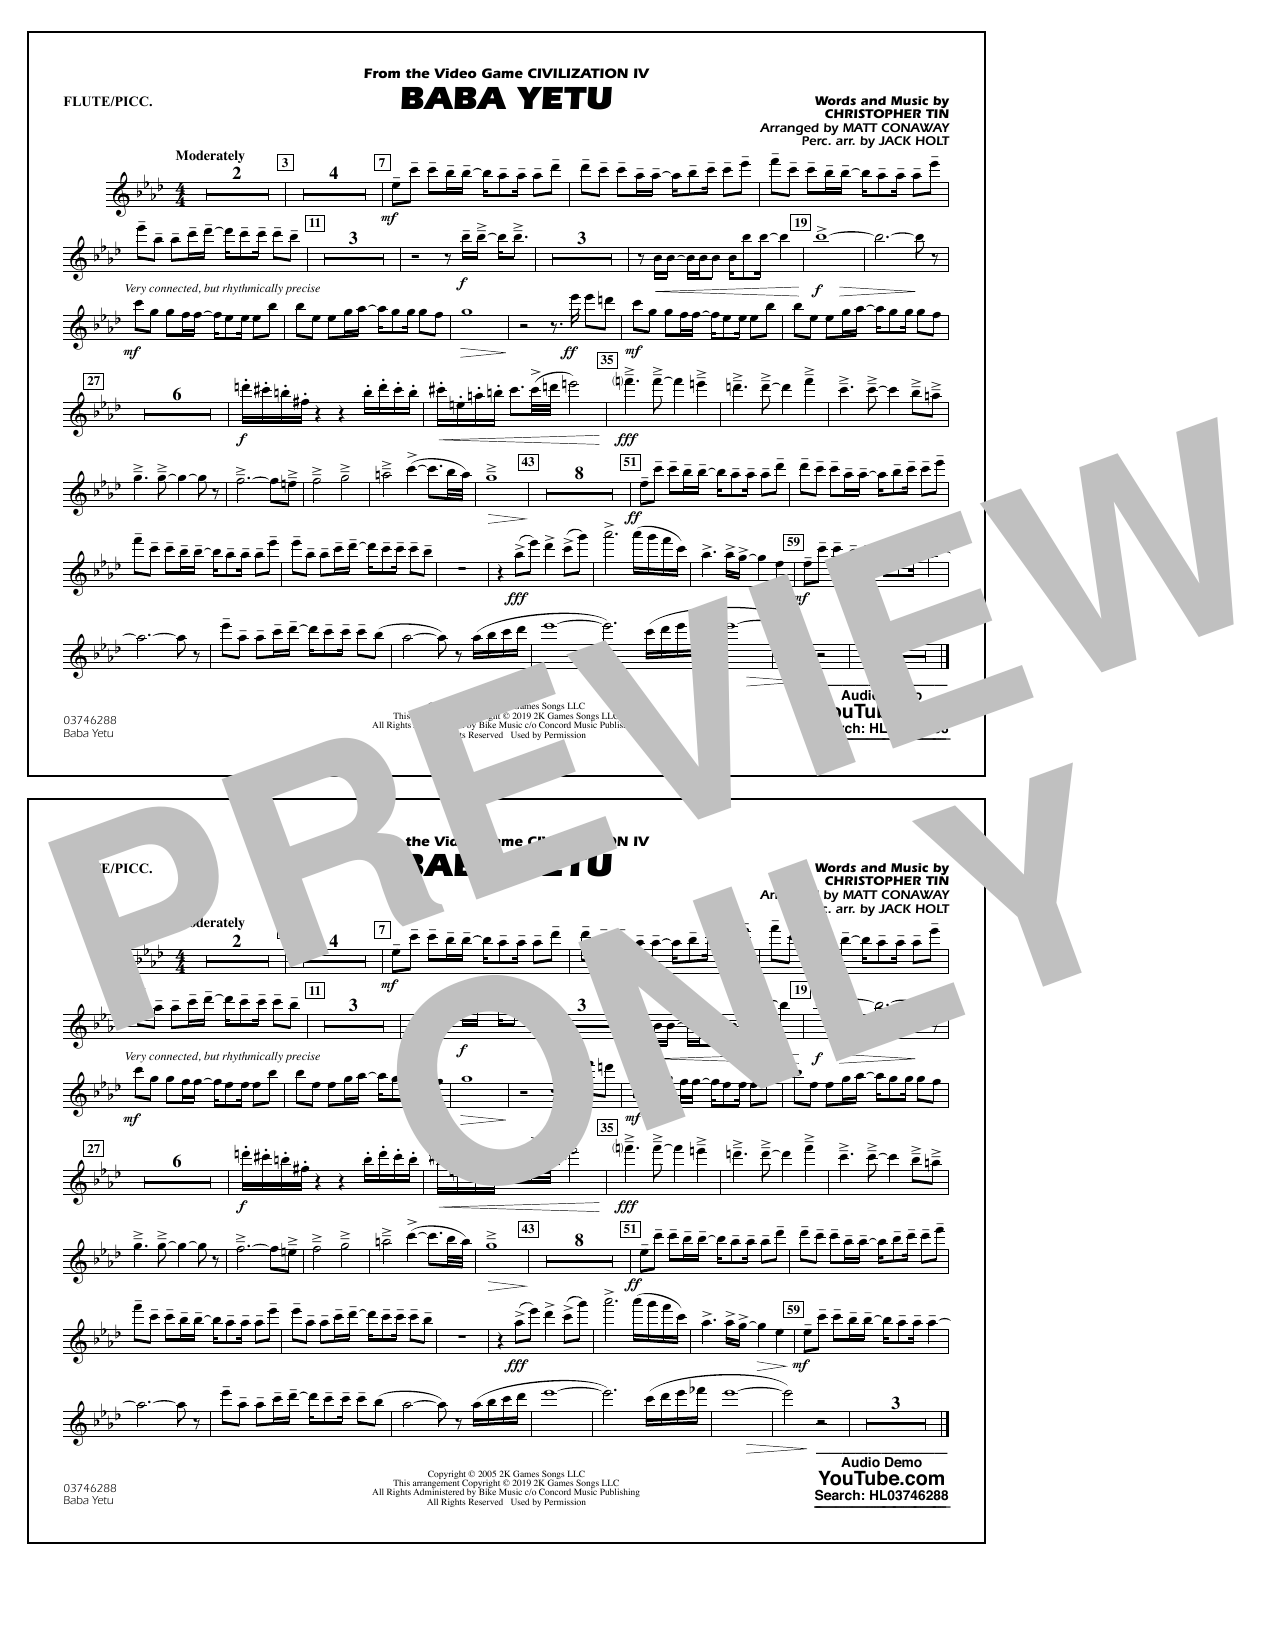 Baba Yetu (from Civilization IV) (arr. Matt Conaway) - Flute/Piccolo (Marching Band)